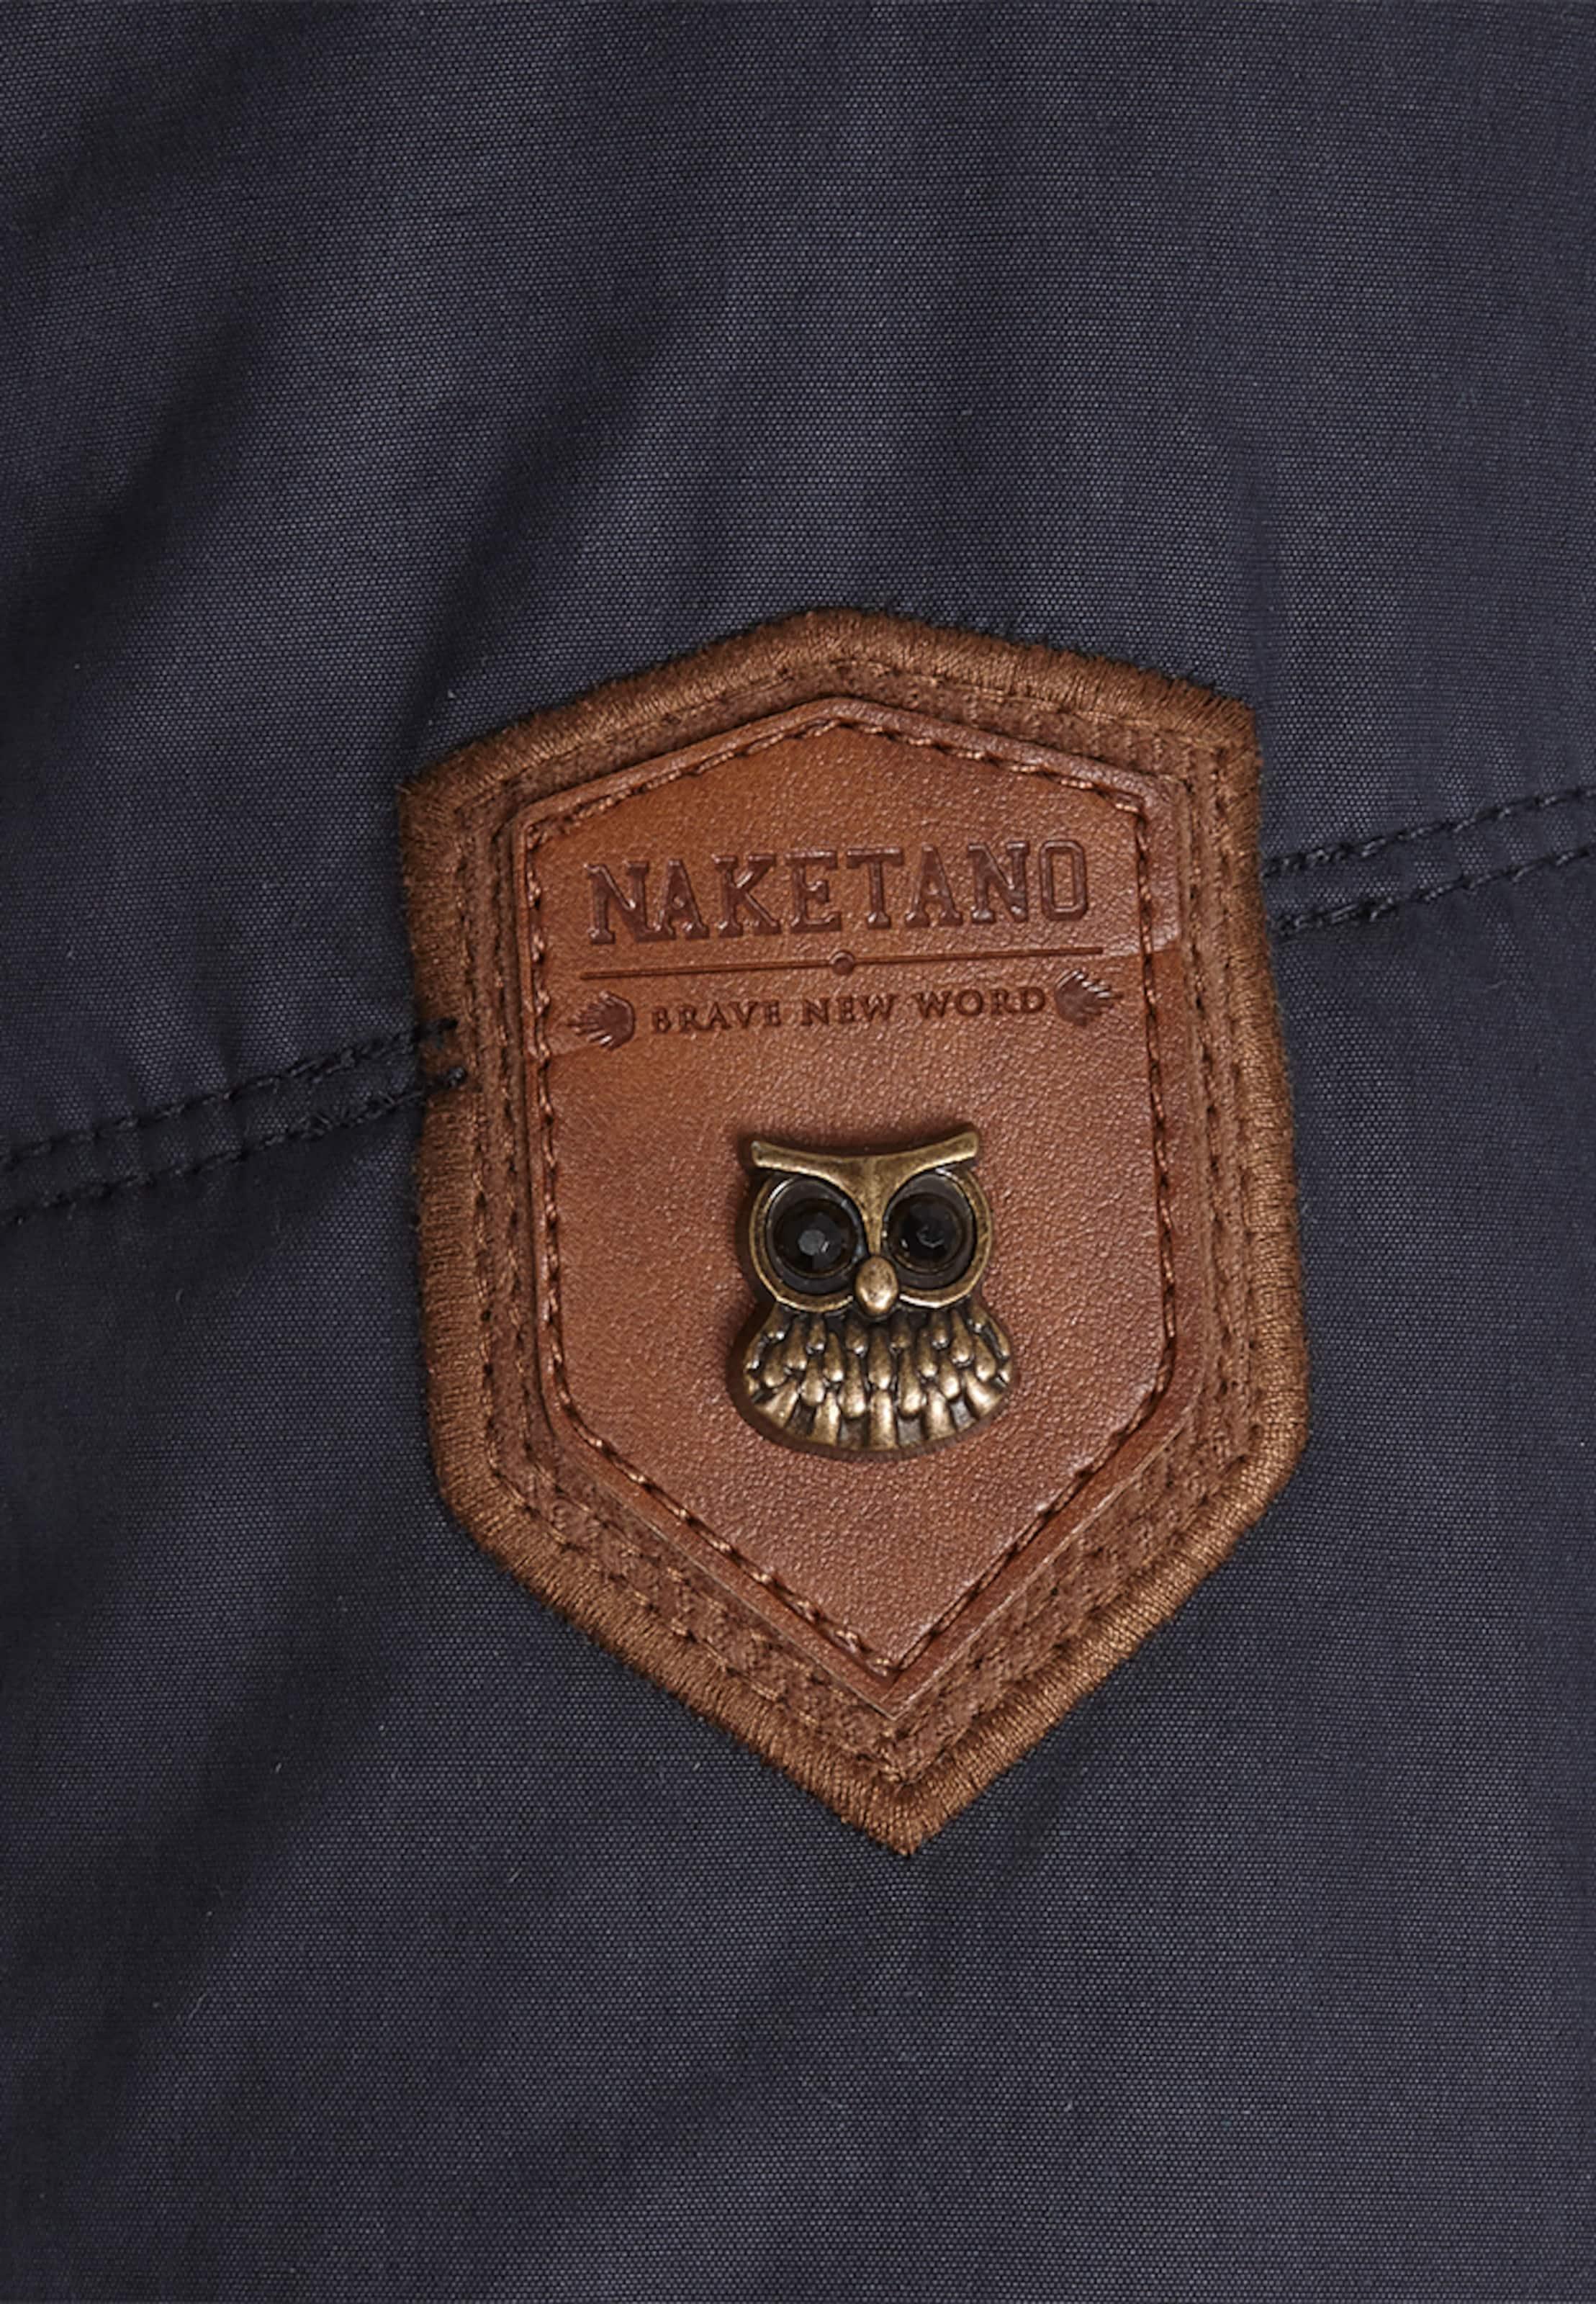 'knastrologin' Jacke DunkelblauBronze Naketano DunkelblauBronze Naketano 'knastrologin' Naketano In Jacke In I9YbD2EHWe